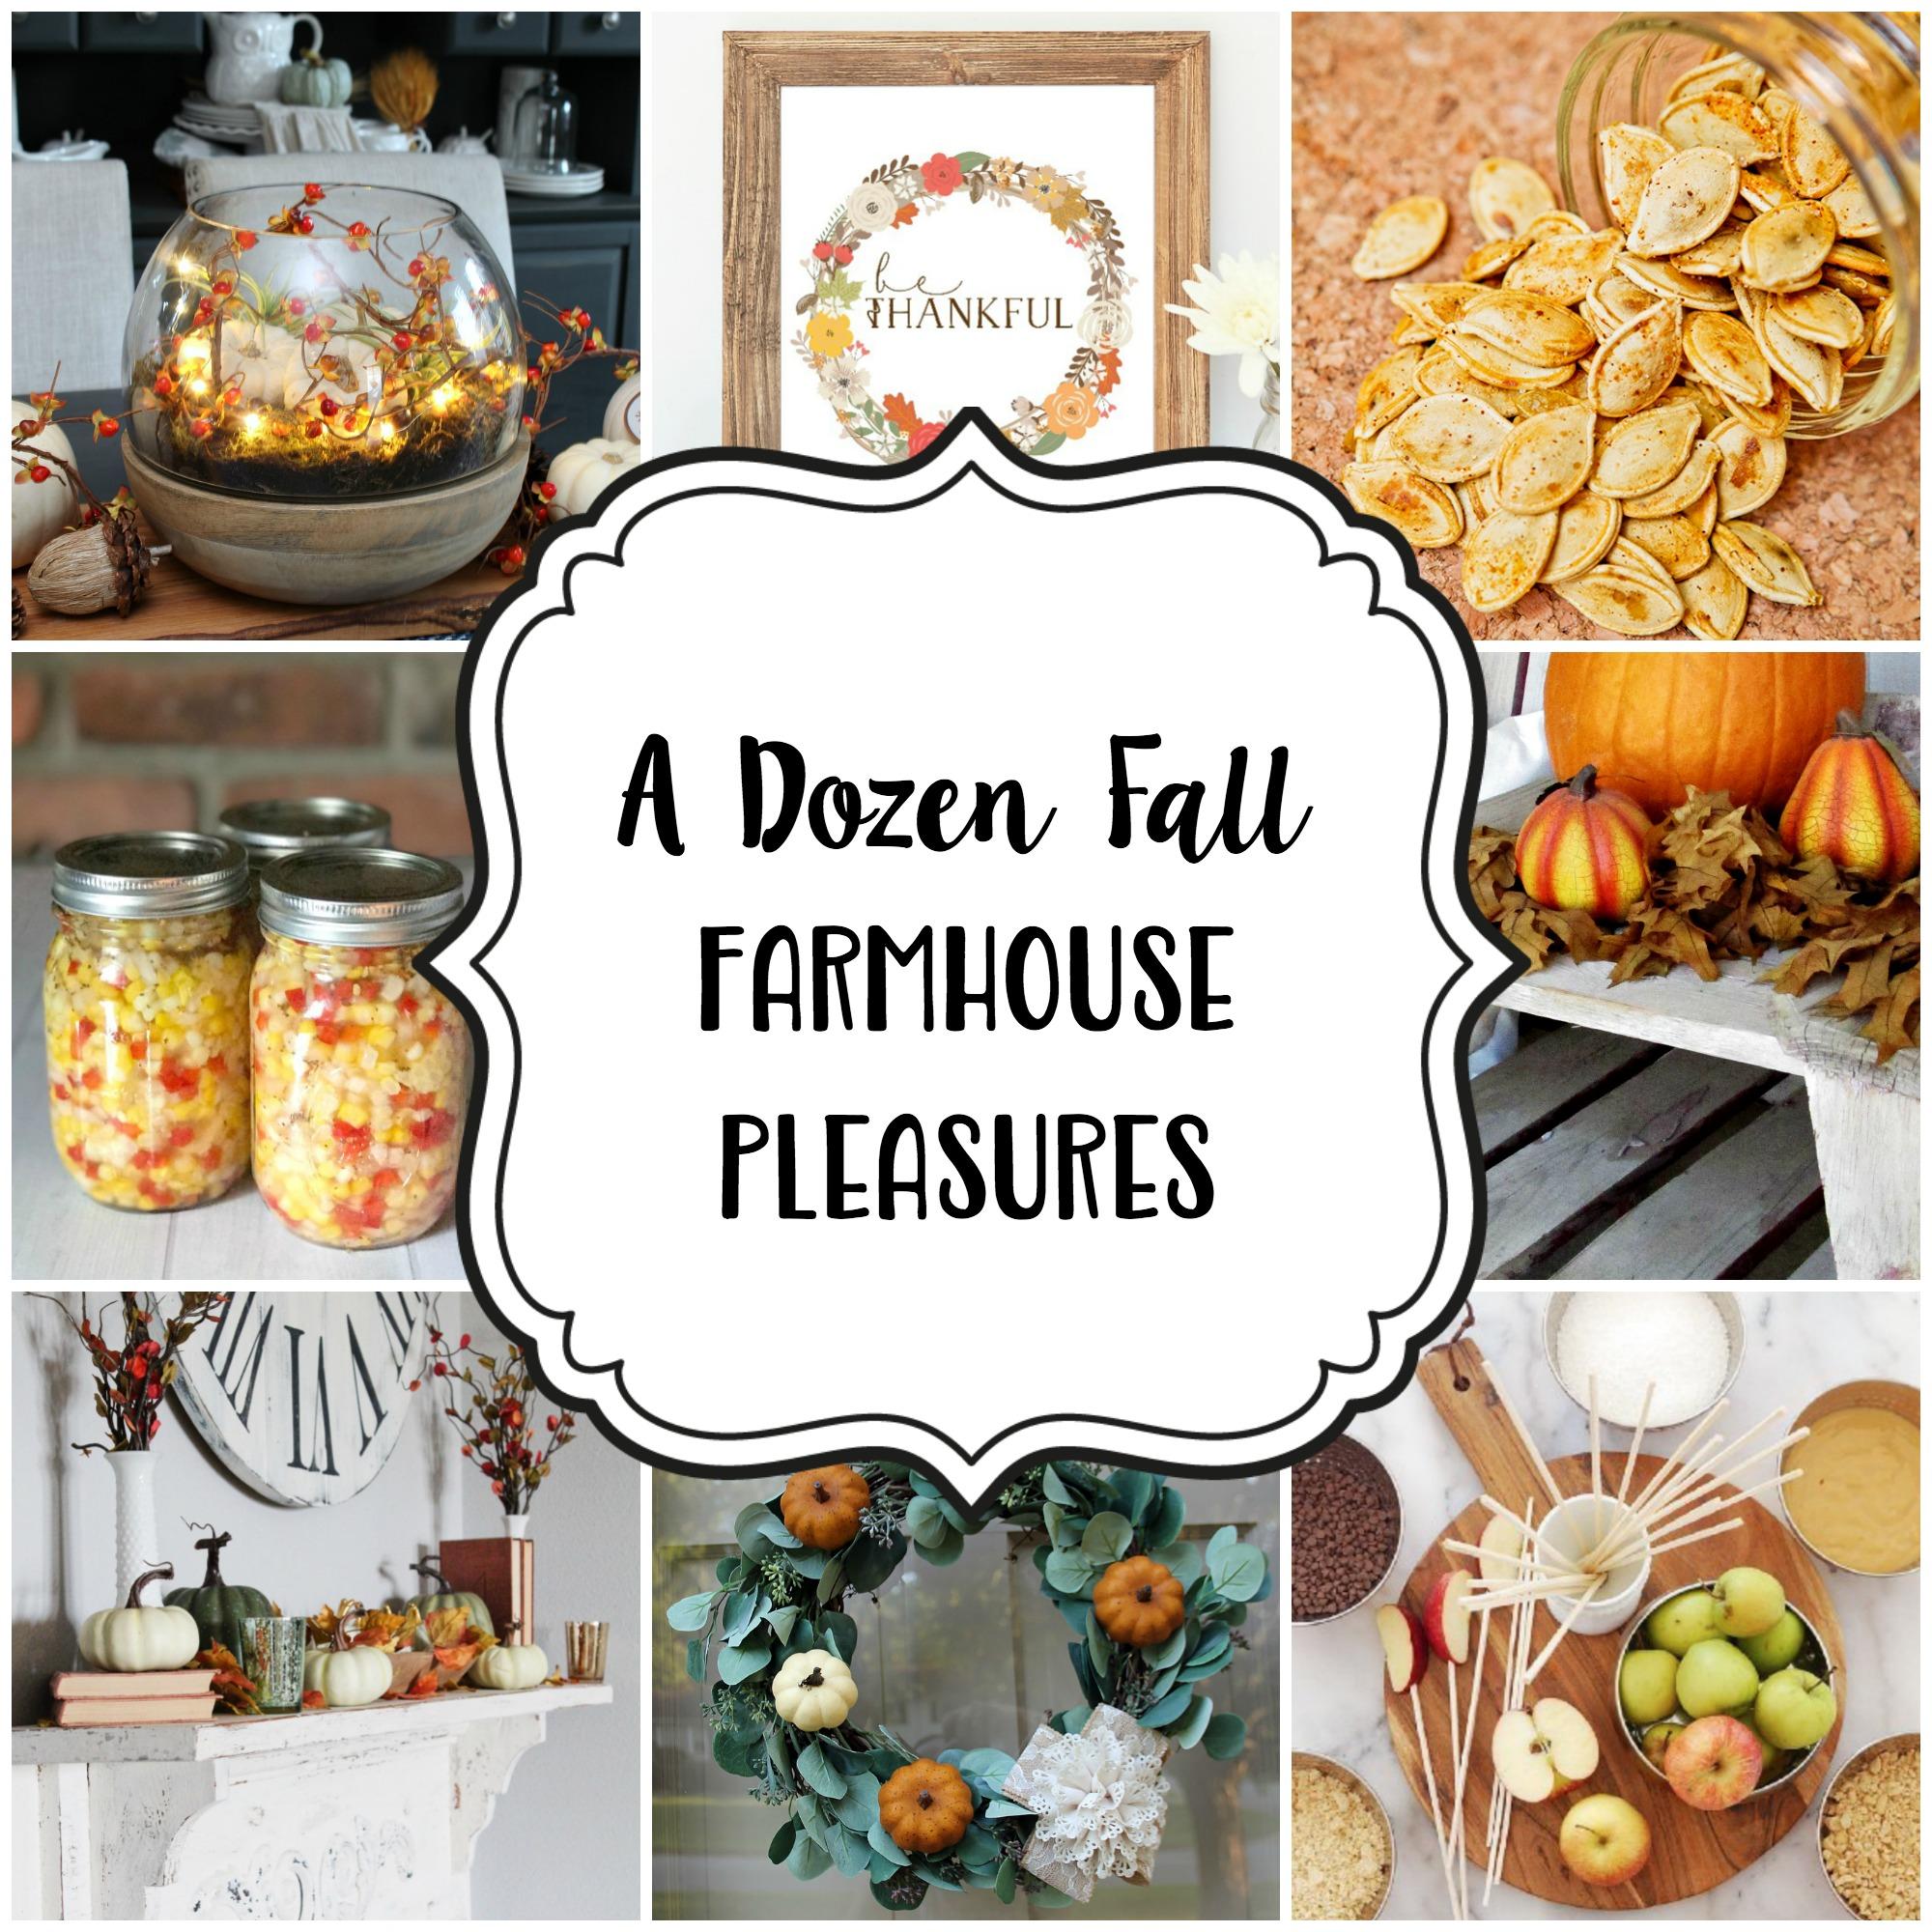 Fall Modern Farmhouse DIYS and Recipes